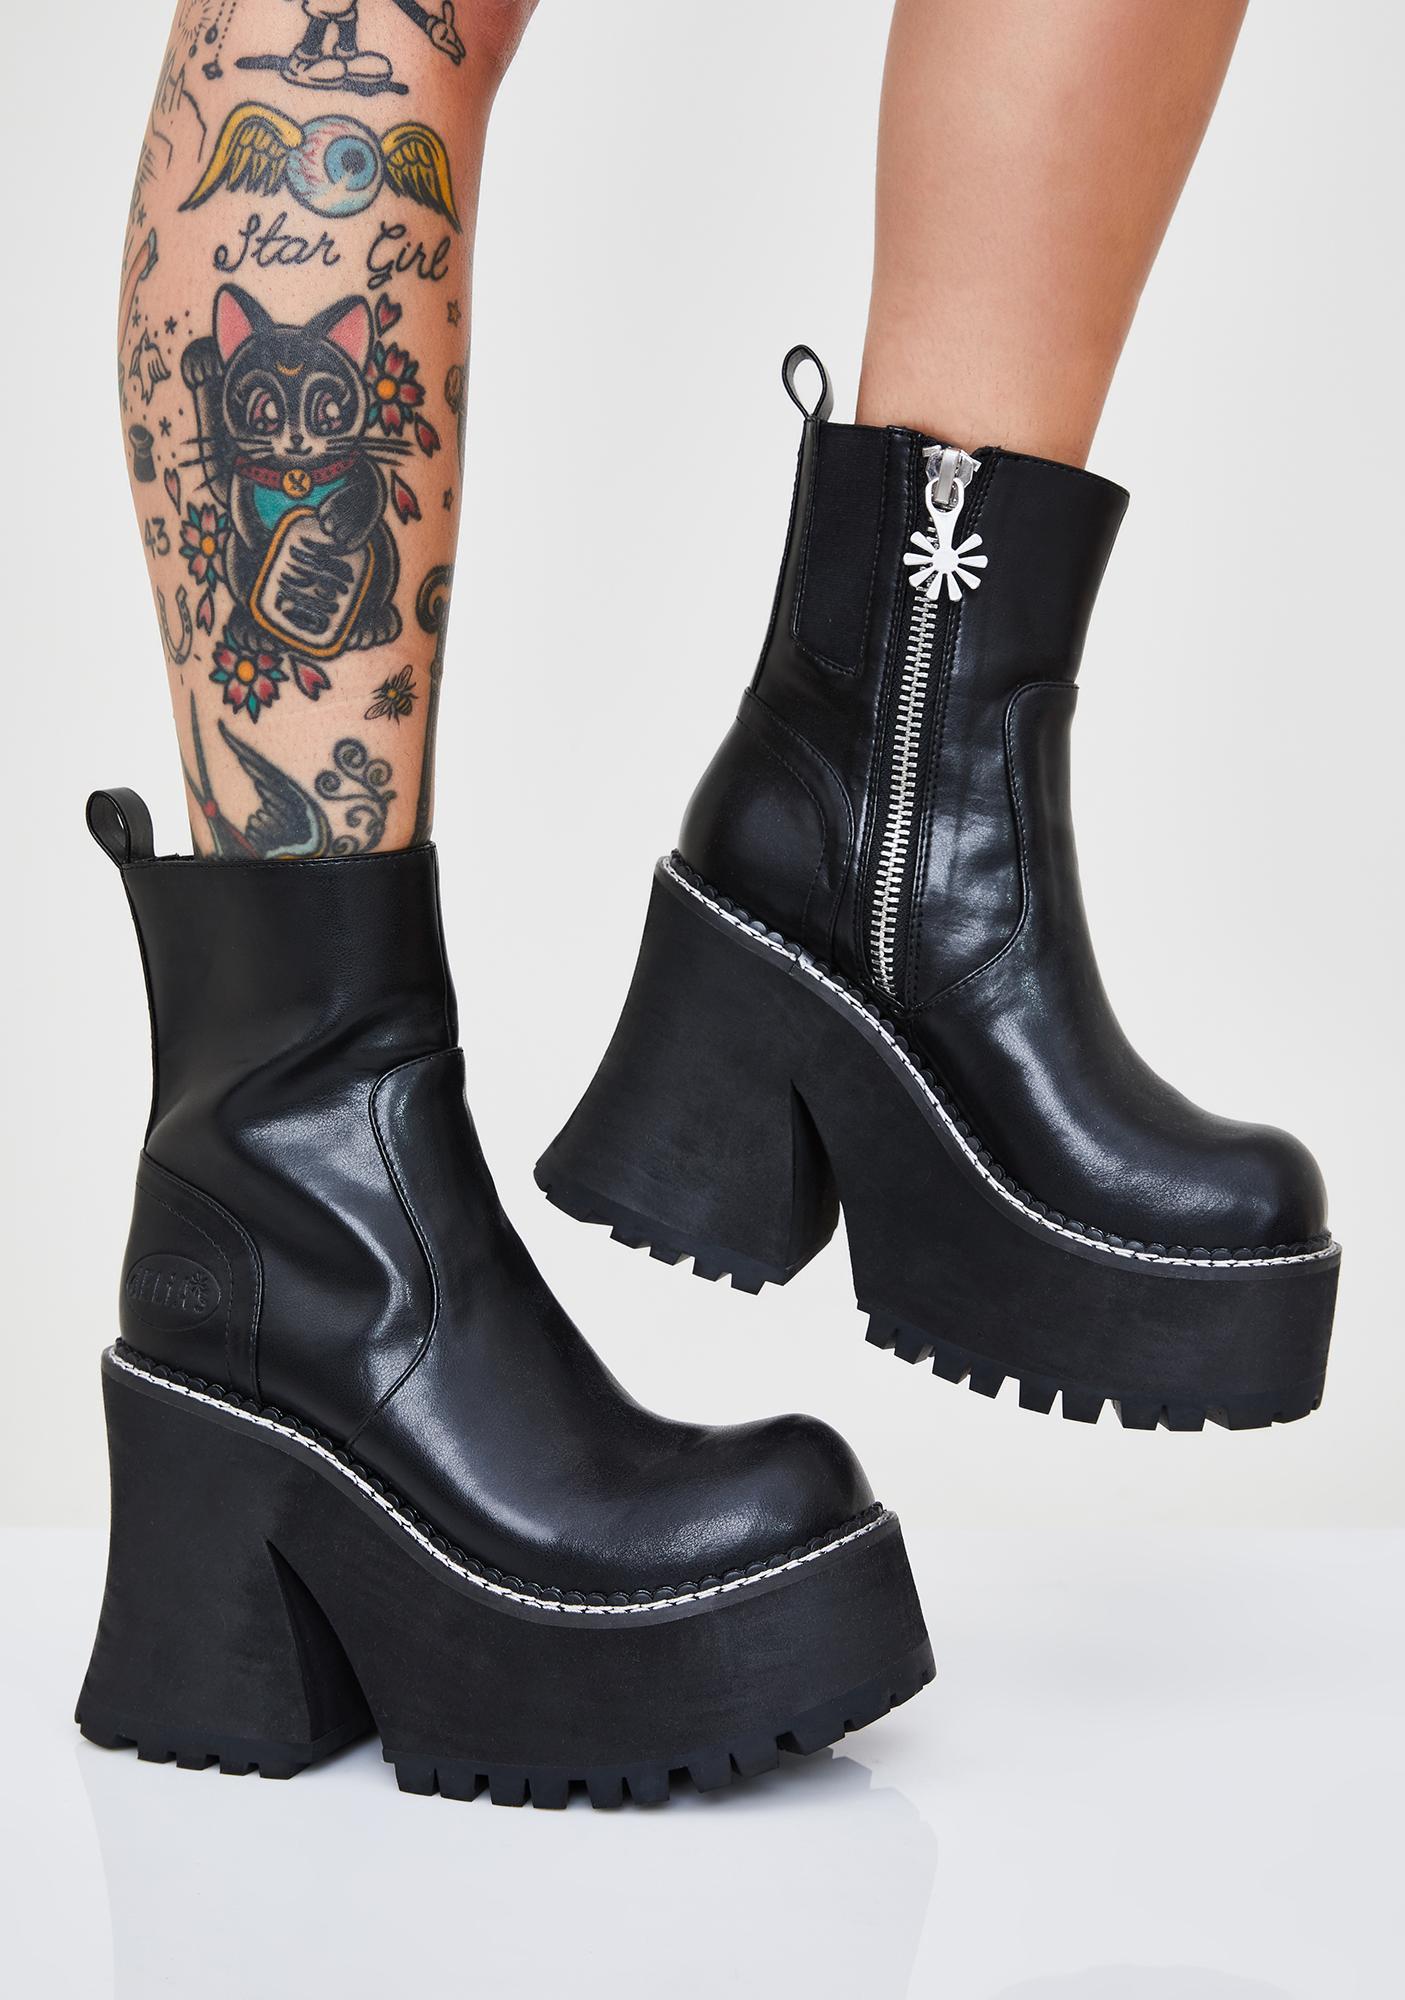 Delia's Smooth Vegan Leather Platform